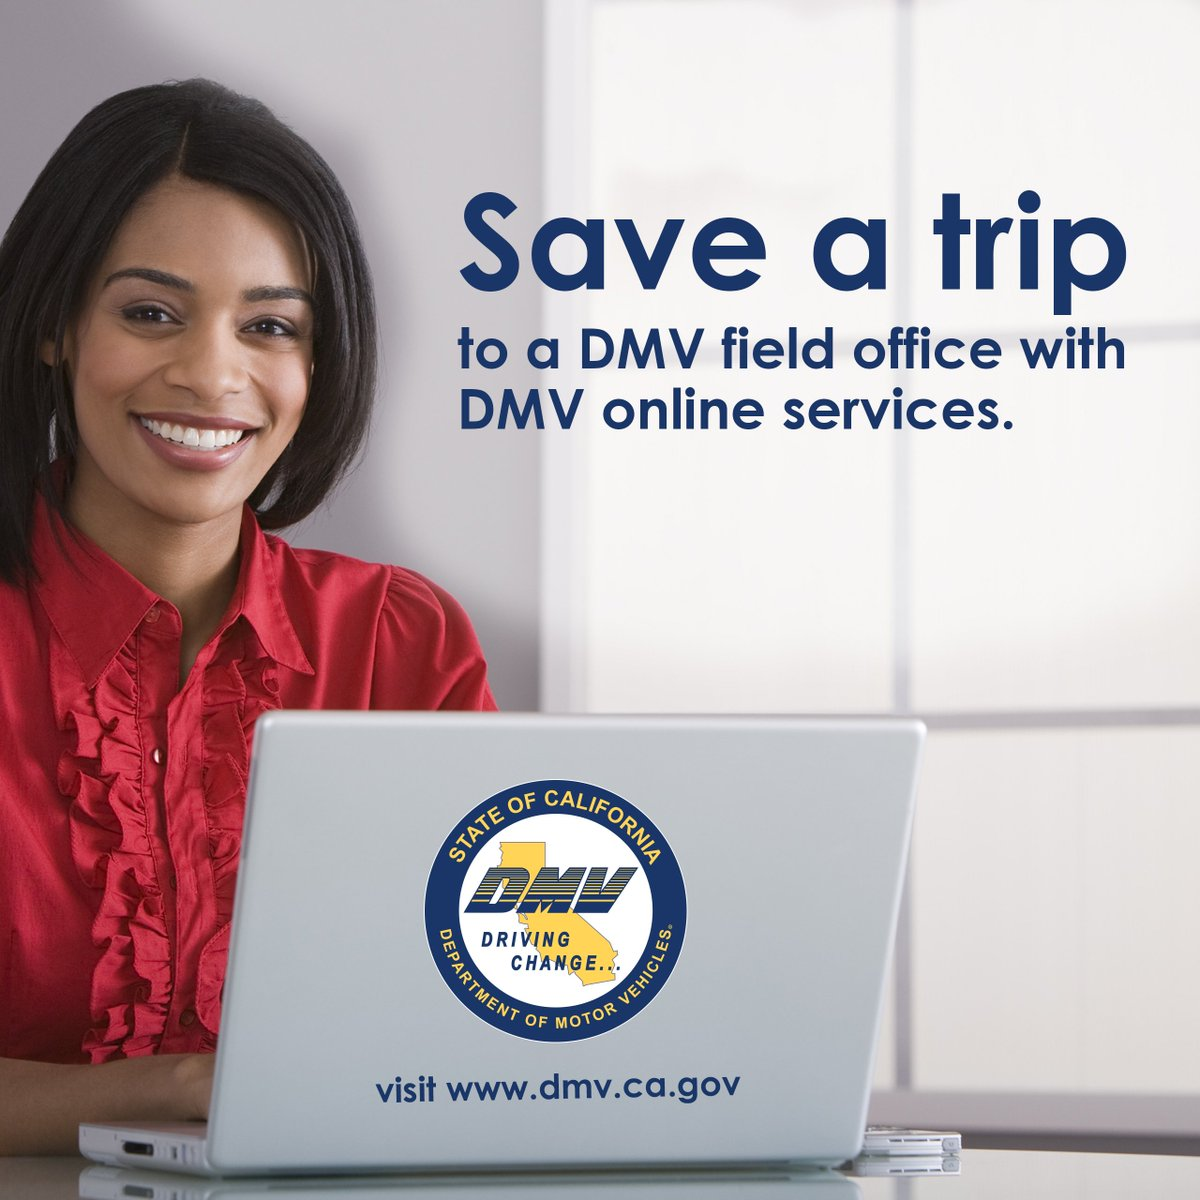 CA DMV on Twitter: